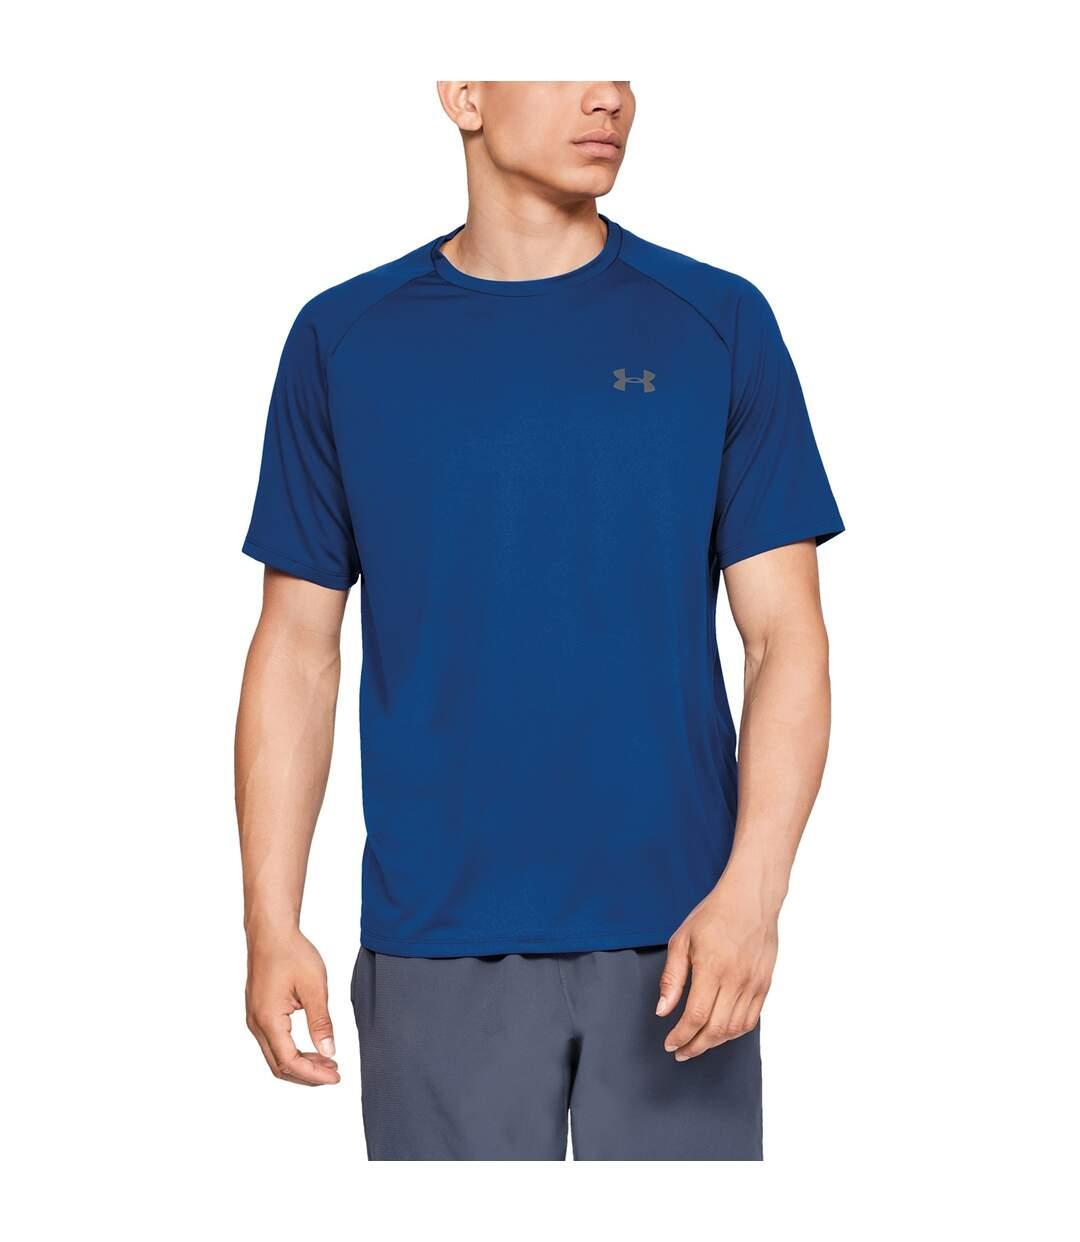 Under Armour Mens Tech T-Shirt (Royal Blue/Graphite) - UTRW7749